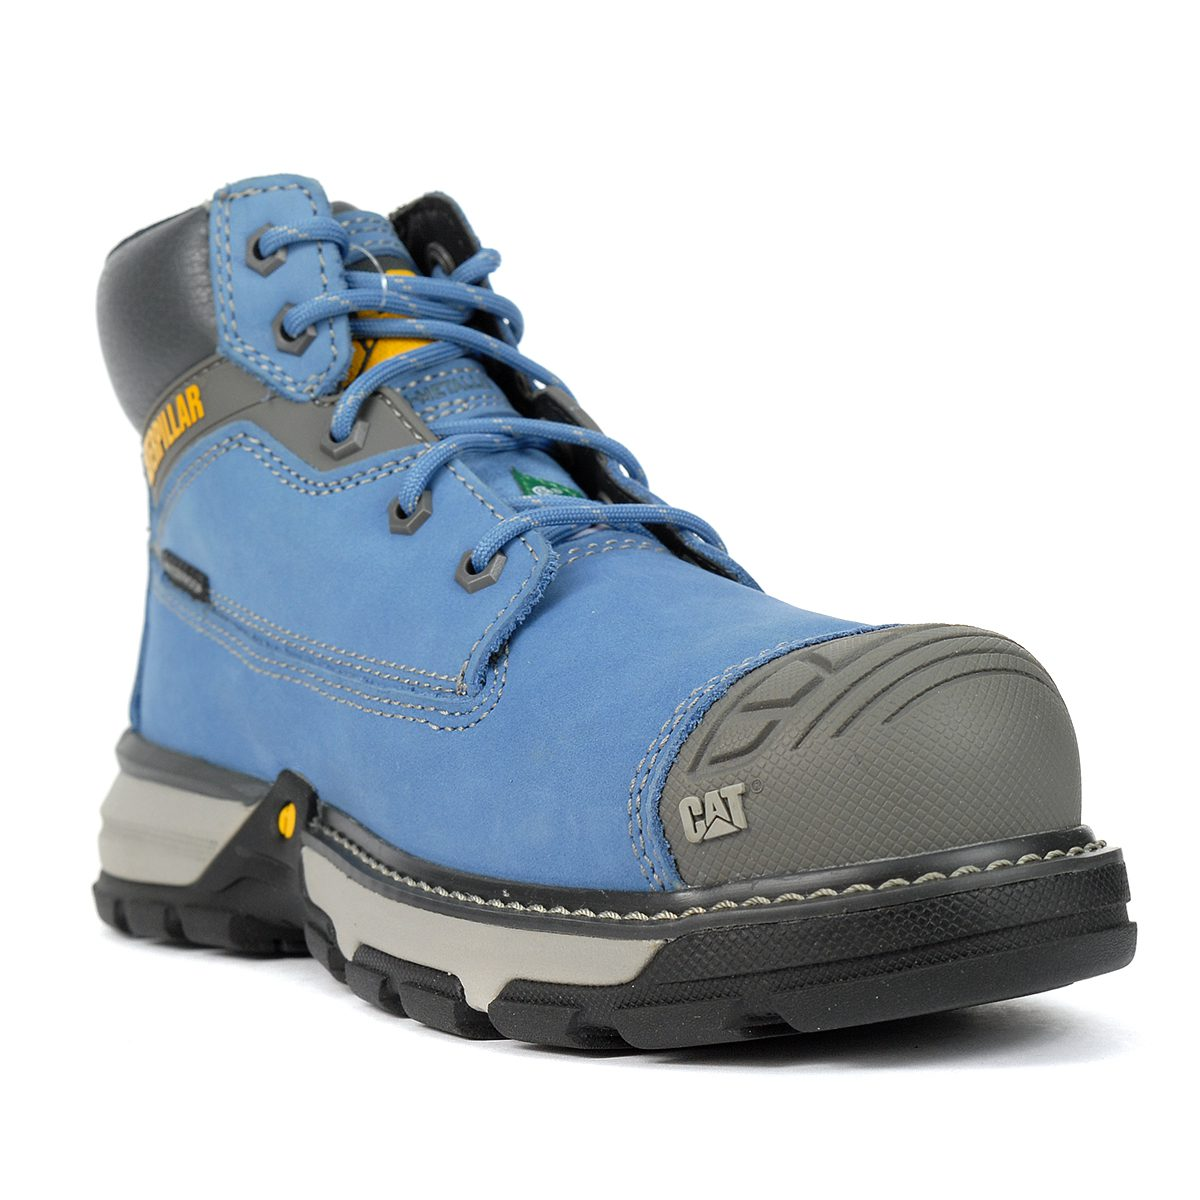 Caterpillar womens Work Fire and Safety Boot 6.5 US Blue Heaven